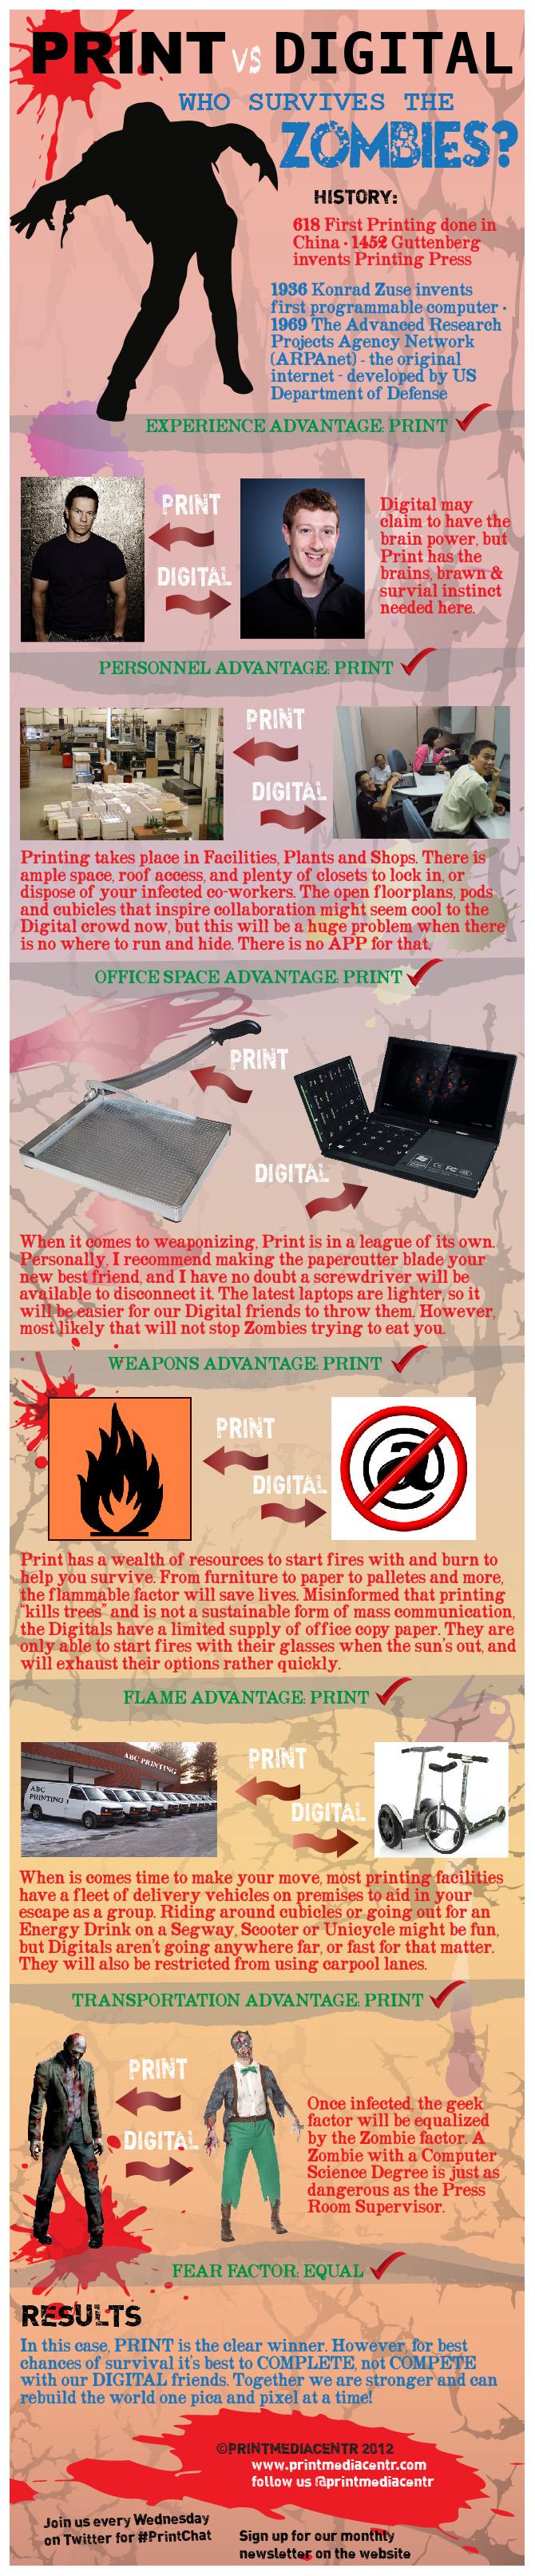 Print_vs_Digital_Zombie_Survival.jpg